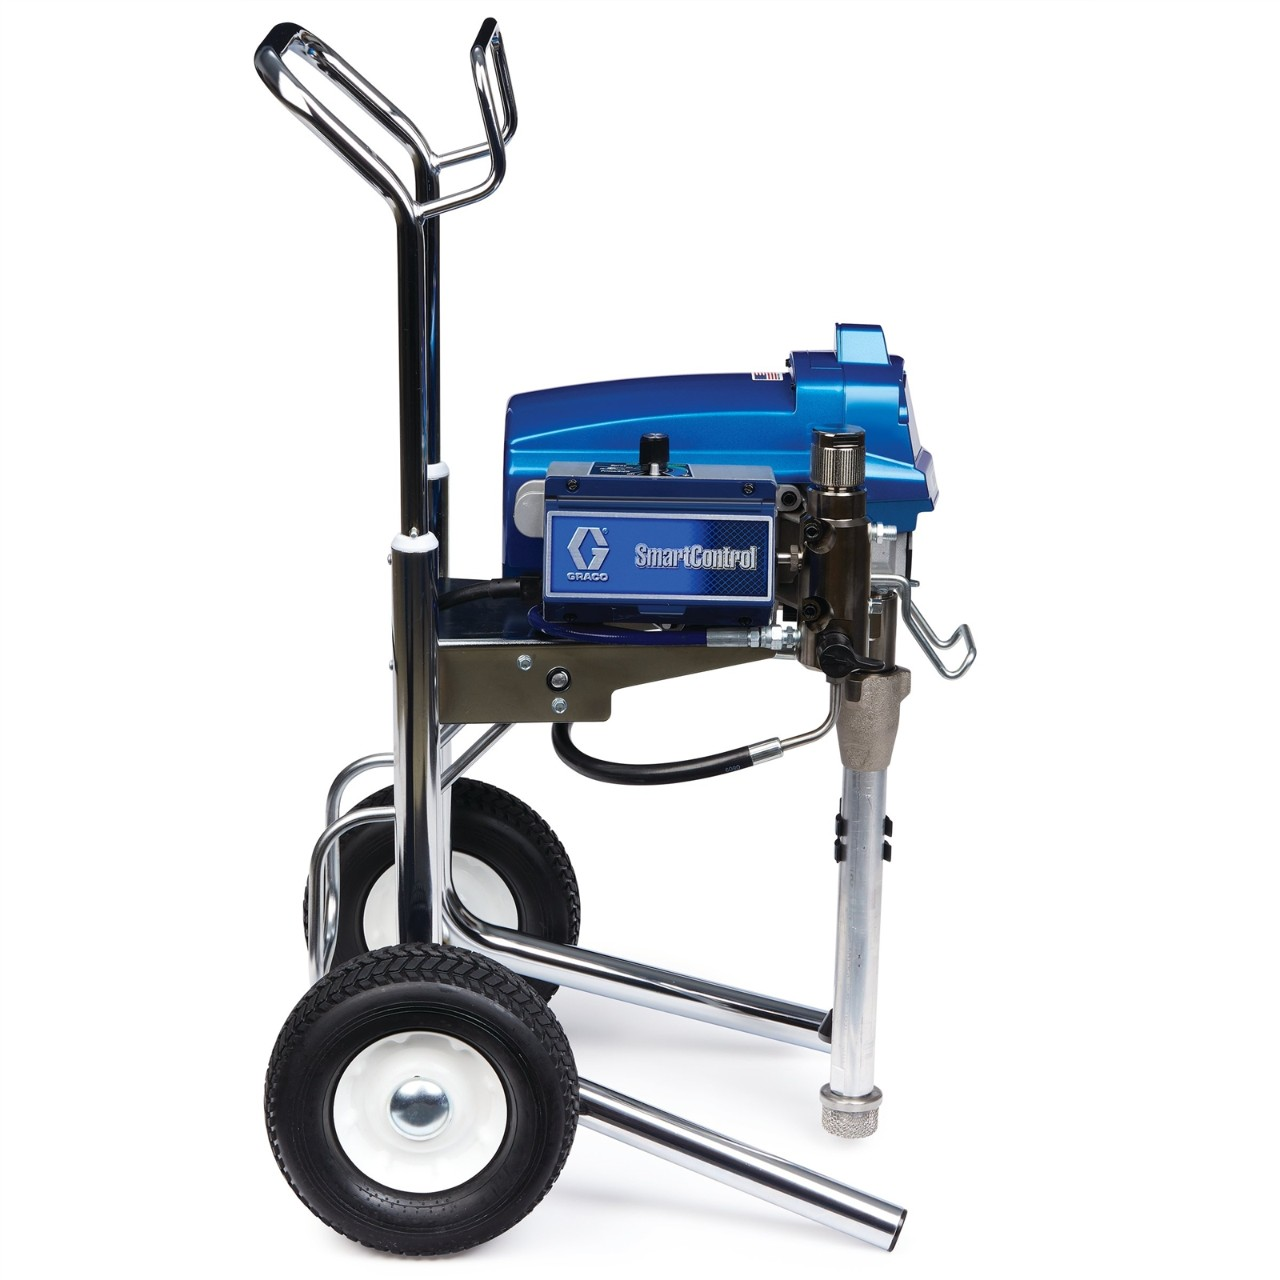 Professional Small to Medium Size Sprayers Graco Ultra 390 PC Hi-Boy Electric Airless Paint Sprayer